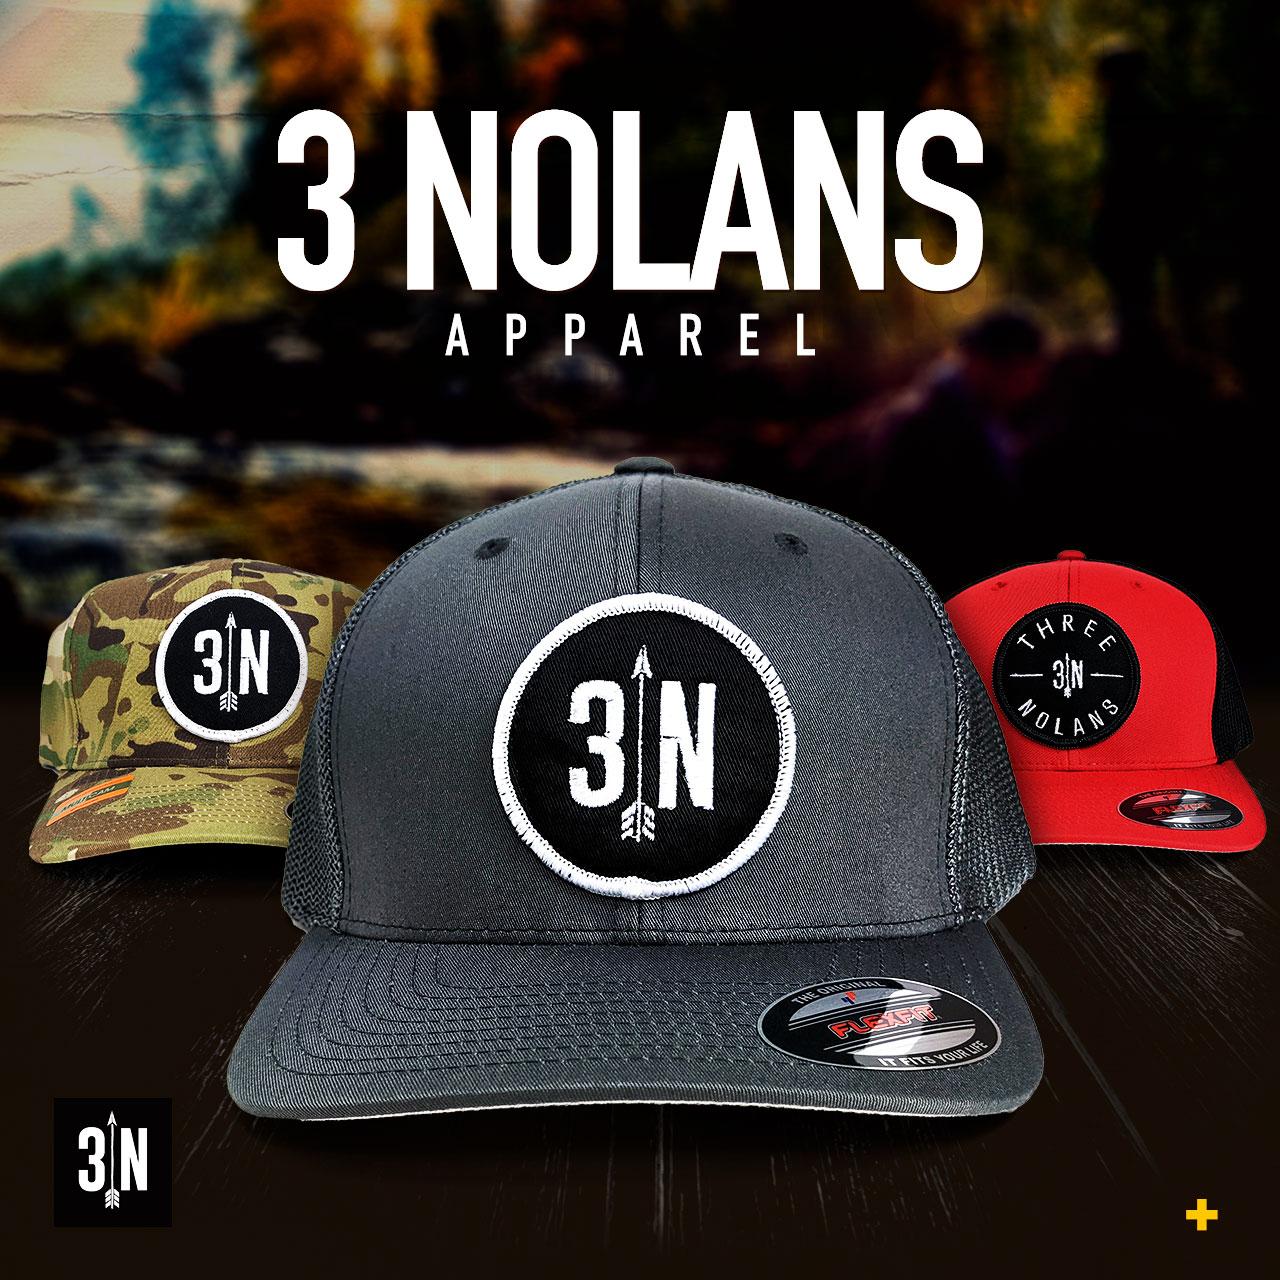 3 Nolans Apparel